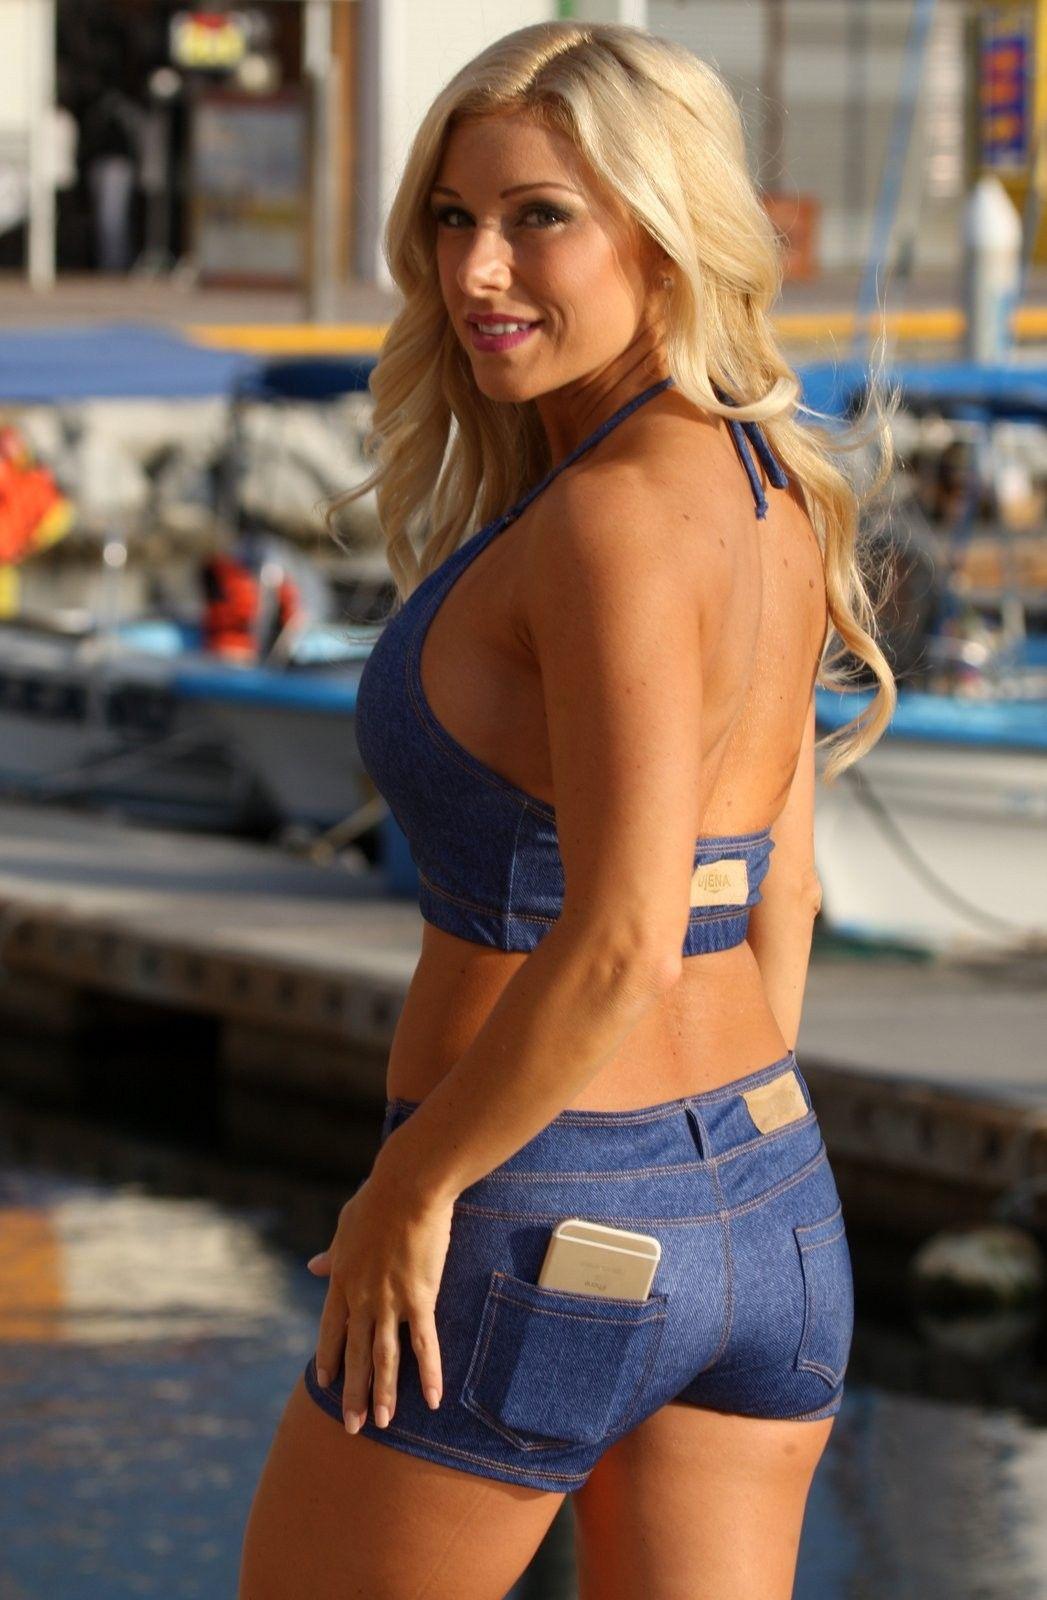 032d0447523b Ujena Baby Blue Jean Short | Products I Love | Boyshort bikini ...